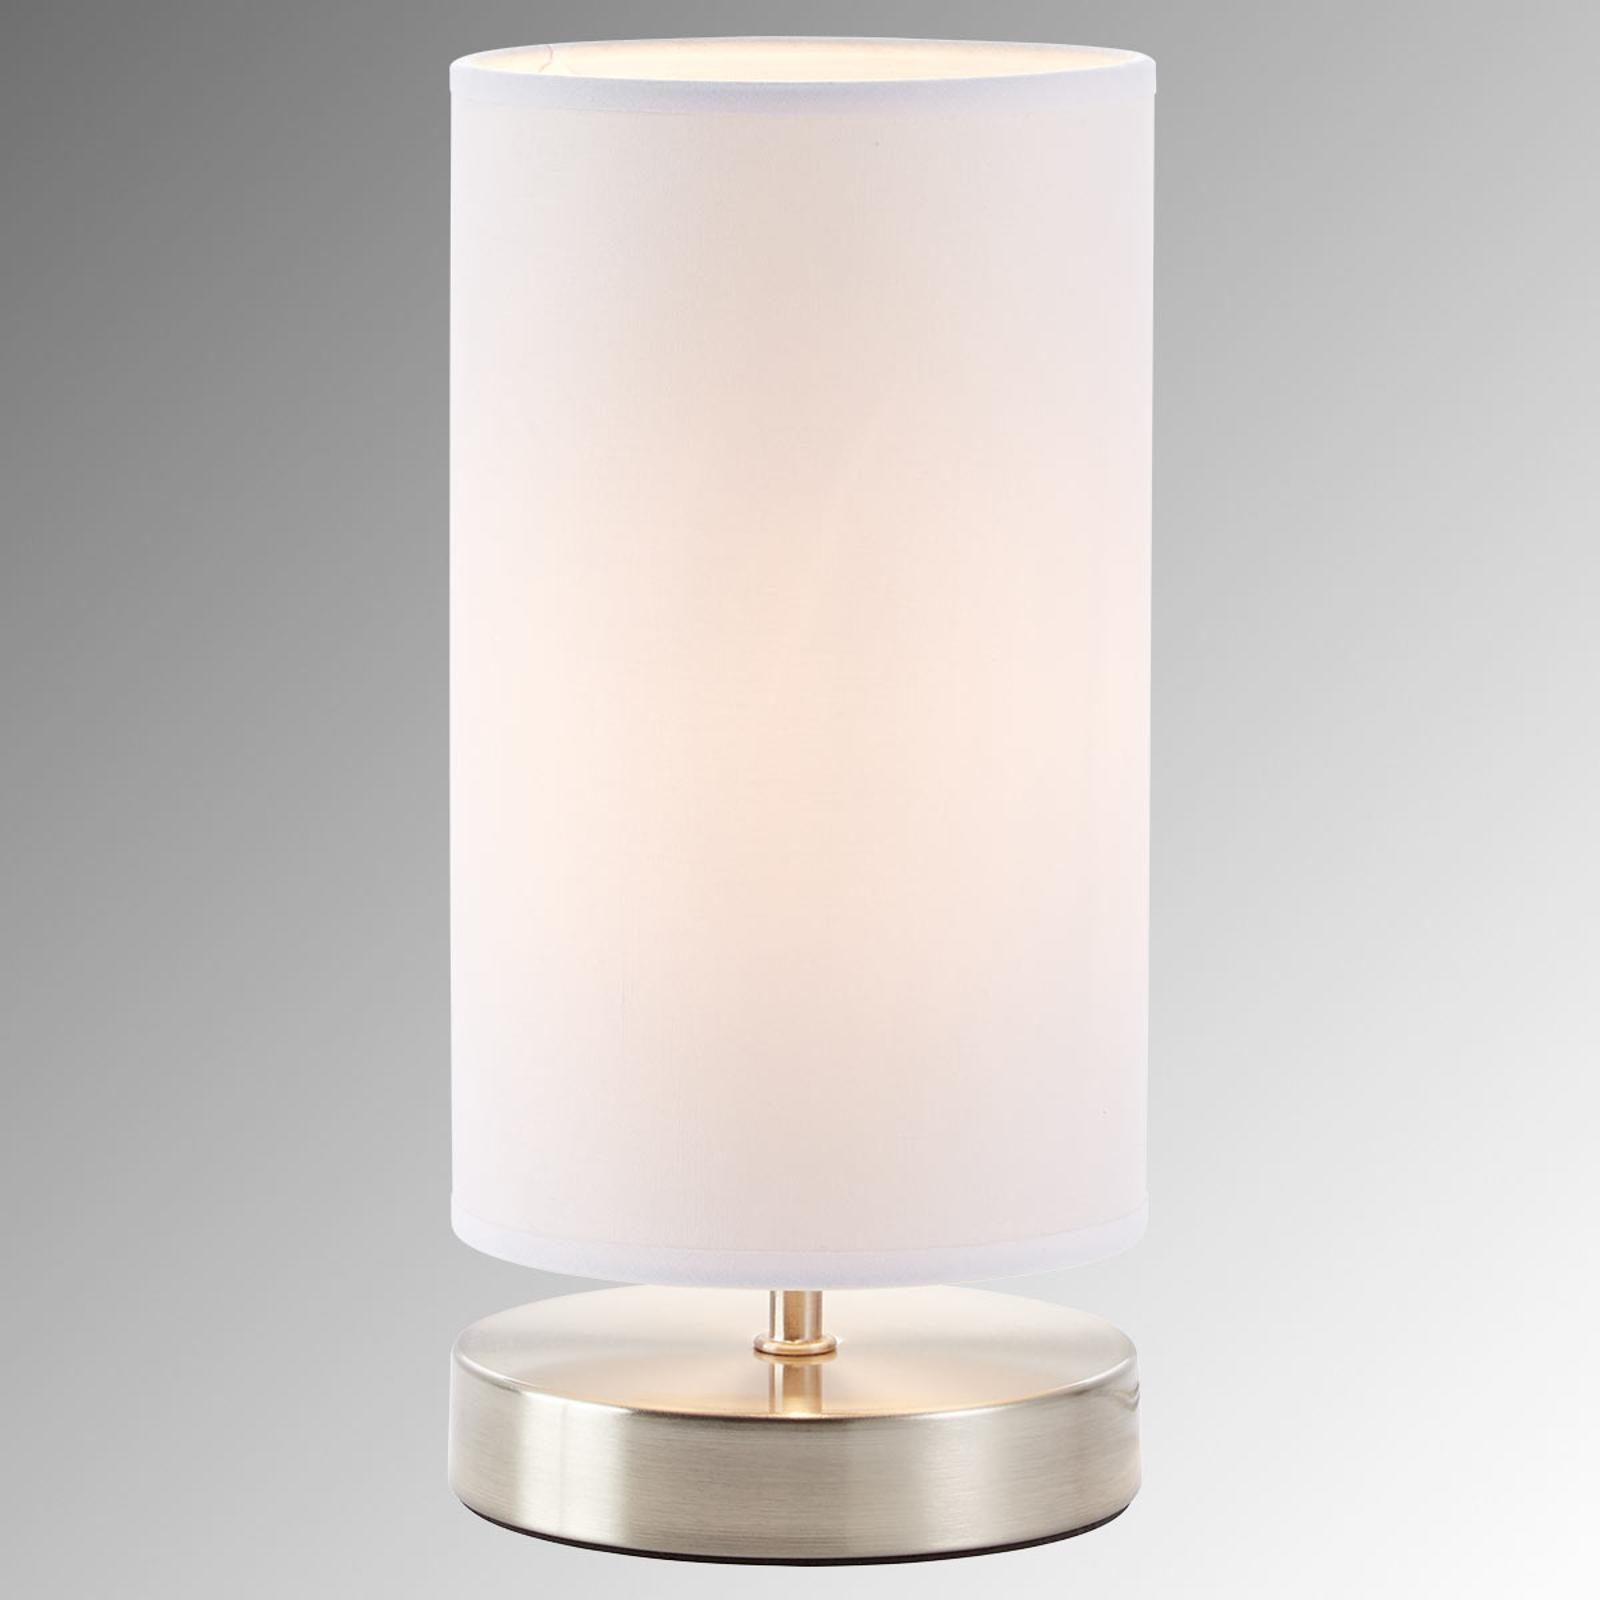 Biela textilná stolná lampa Clarie_1508857_1